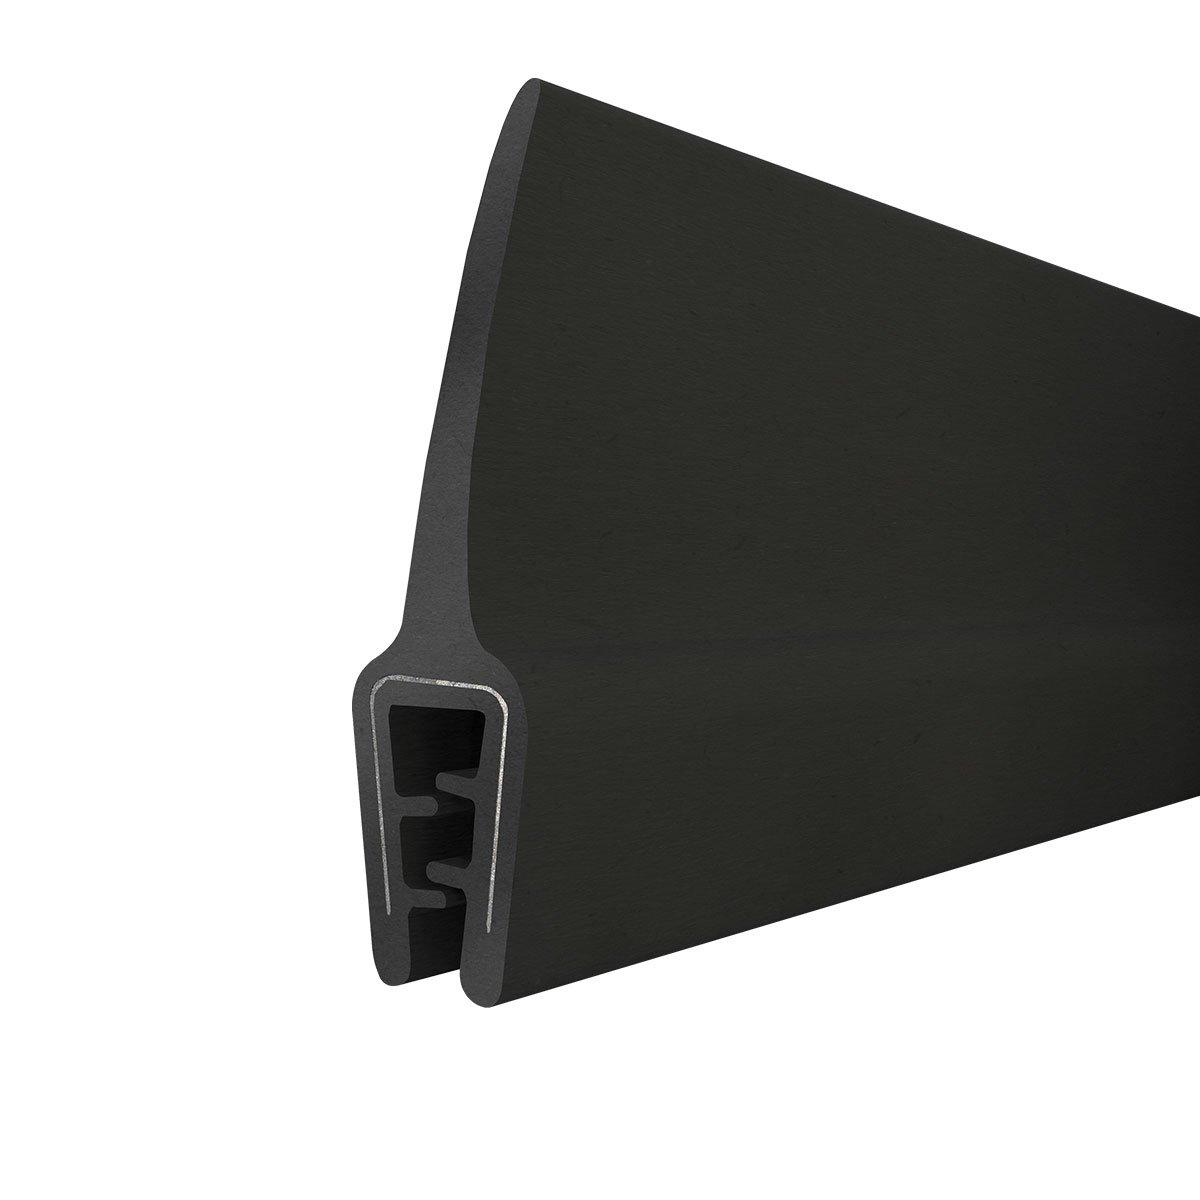 STEIGNER Junta de borde de goma T-45 Negro 10x33 mm 3 m Inserto Metá lico Perfil de caucho Protecció n de borde Refuerzo de Borde